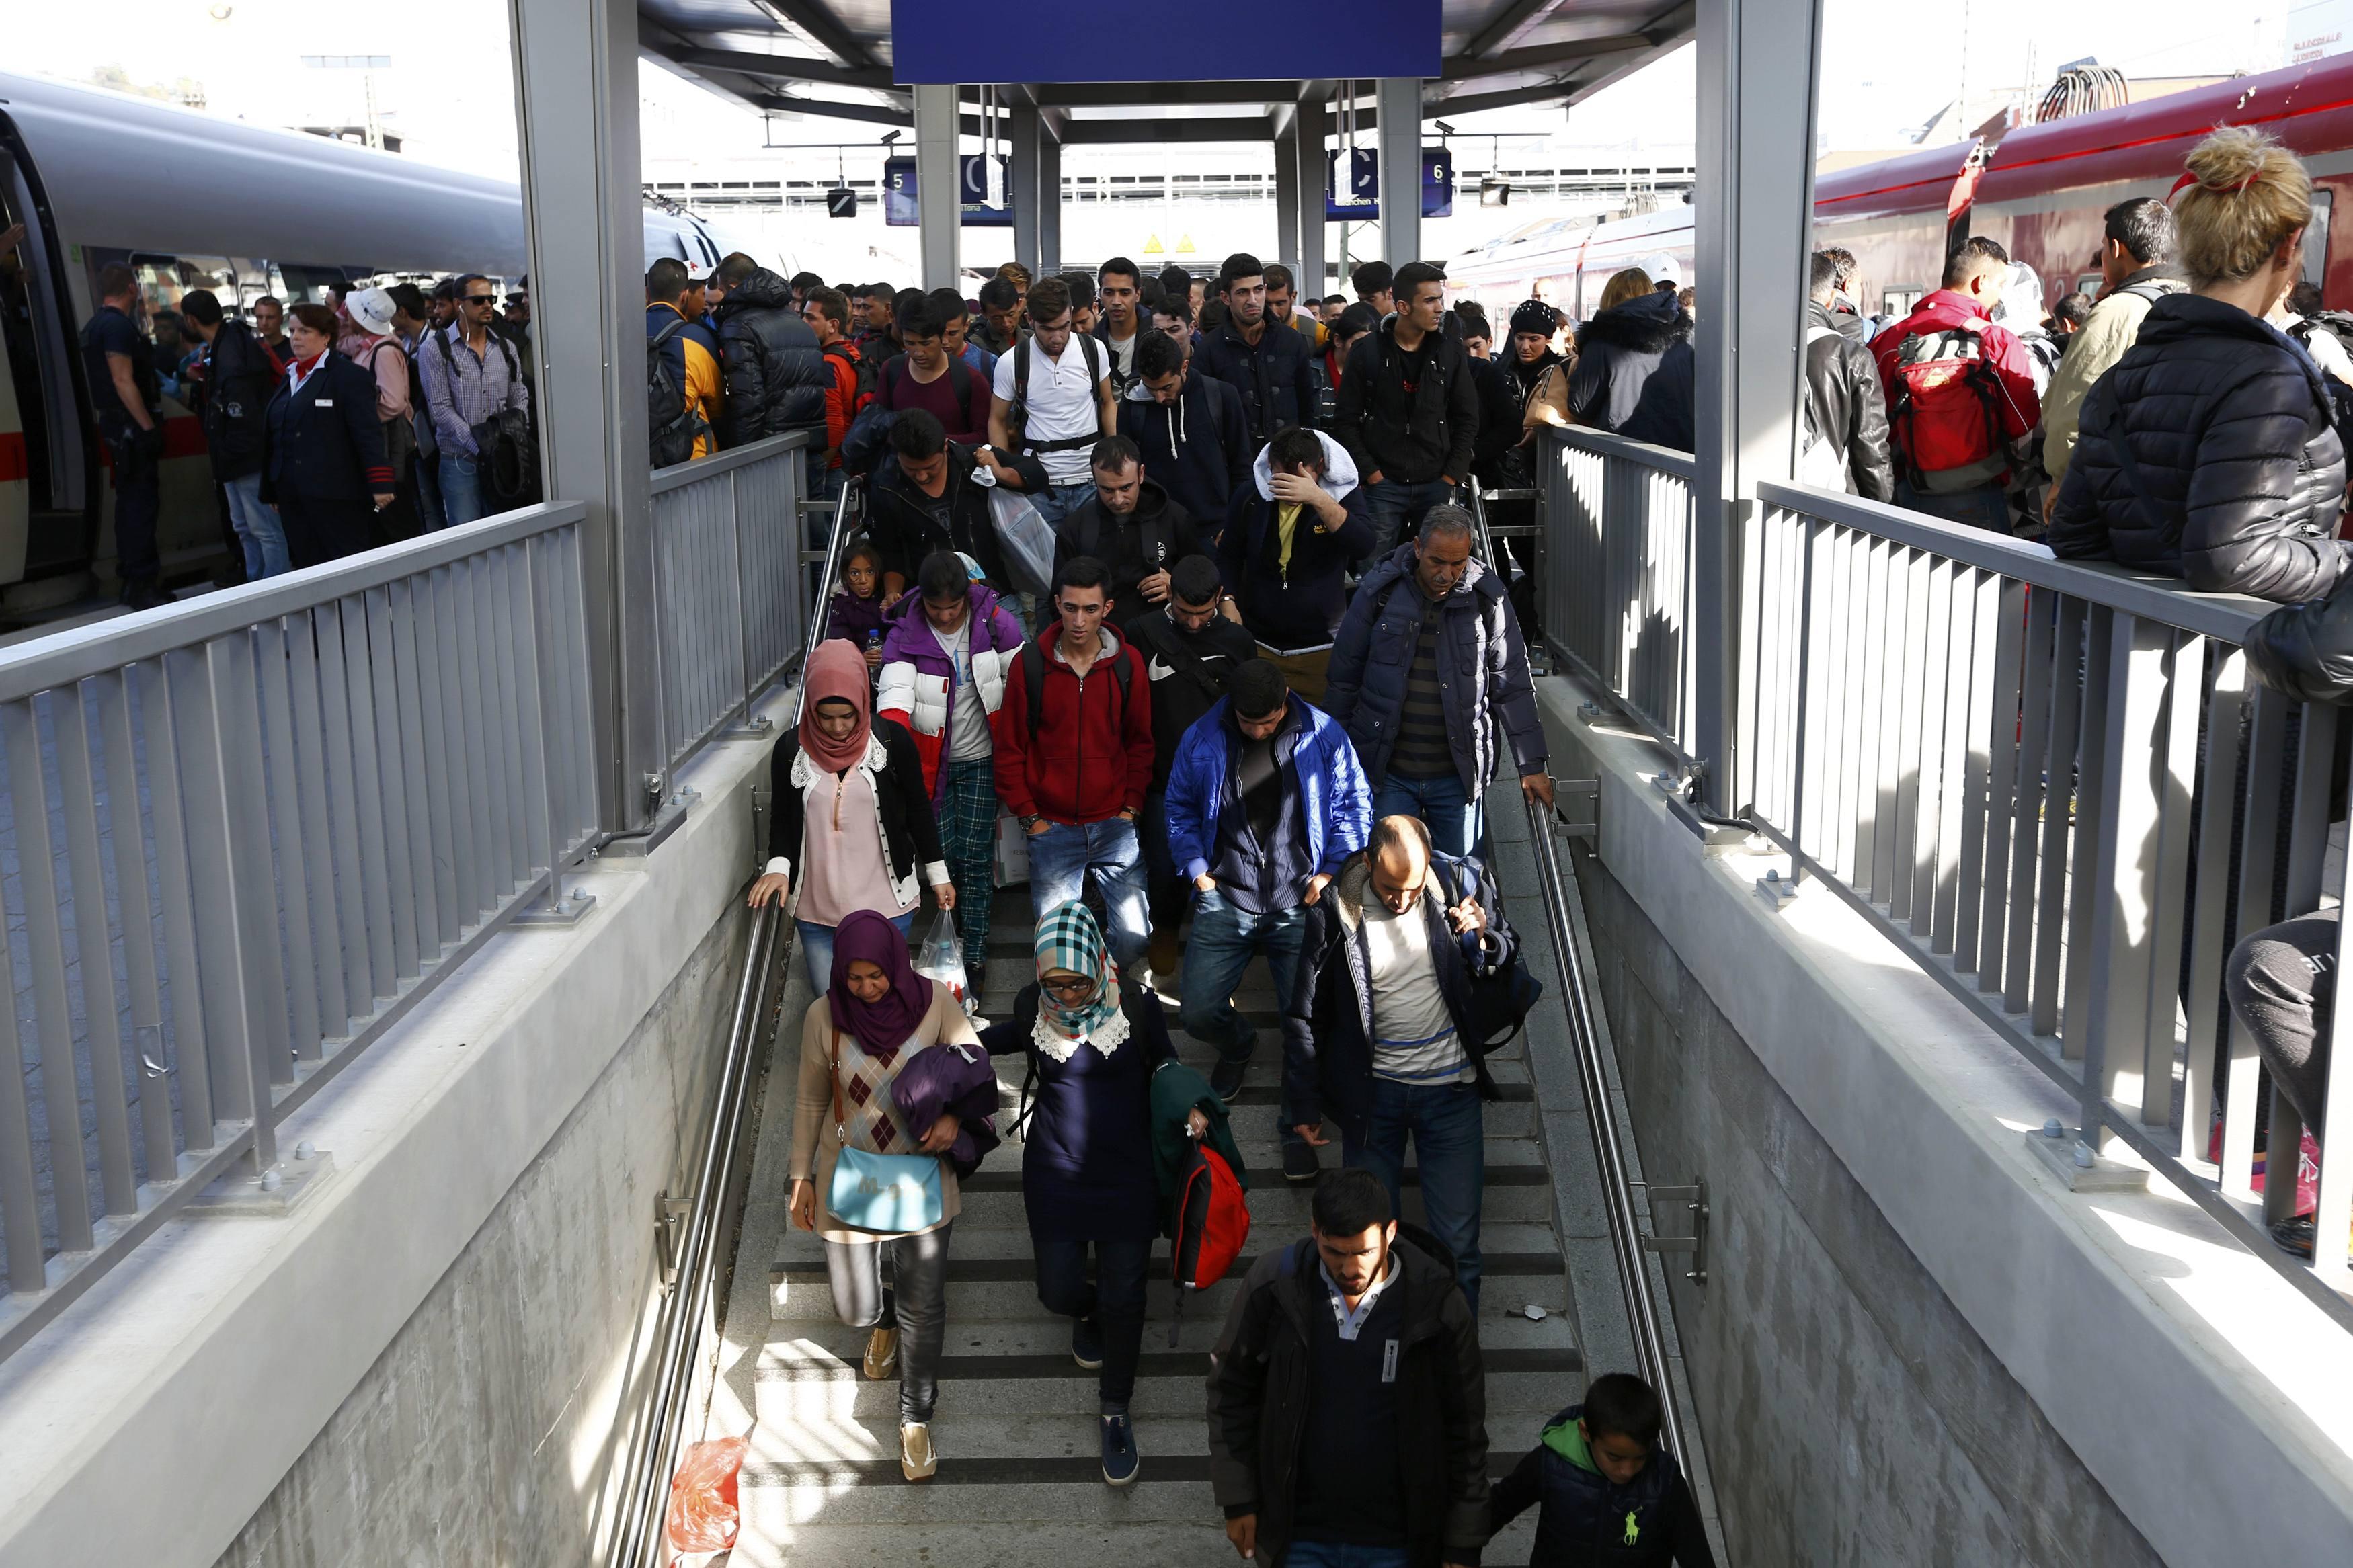 Sebanyak 300 imigran menggunakan jembatan bawah tanah saat tiba dari Linz, Austria di stasiun pusat di Passau, tenggara Jerman, Senin (5/10). Aparat berwenang Jerman memperkirakan sebanyak 1,5 juta pencari suaka tiba di Jerman tahun ini, menurut keterangan harian Bild dalam laporan yang disiarkan kemarin, lebih banyak dari angka yang diperkirakan sebelumnya yaitu 800.00 hingga 1 juta. Koran papan atas Jerman itu mengutip perkiraan internal yang dikategorikan rahasia dari aparat berwenang. ANTARA FOTO/REUTERS/Michaela Rehle.